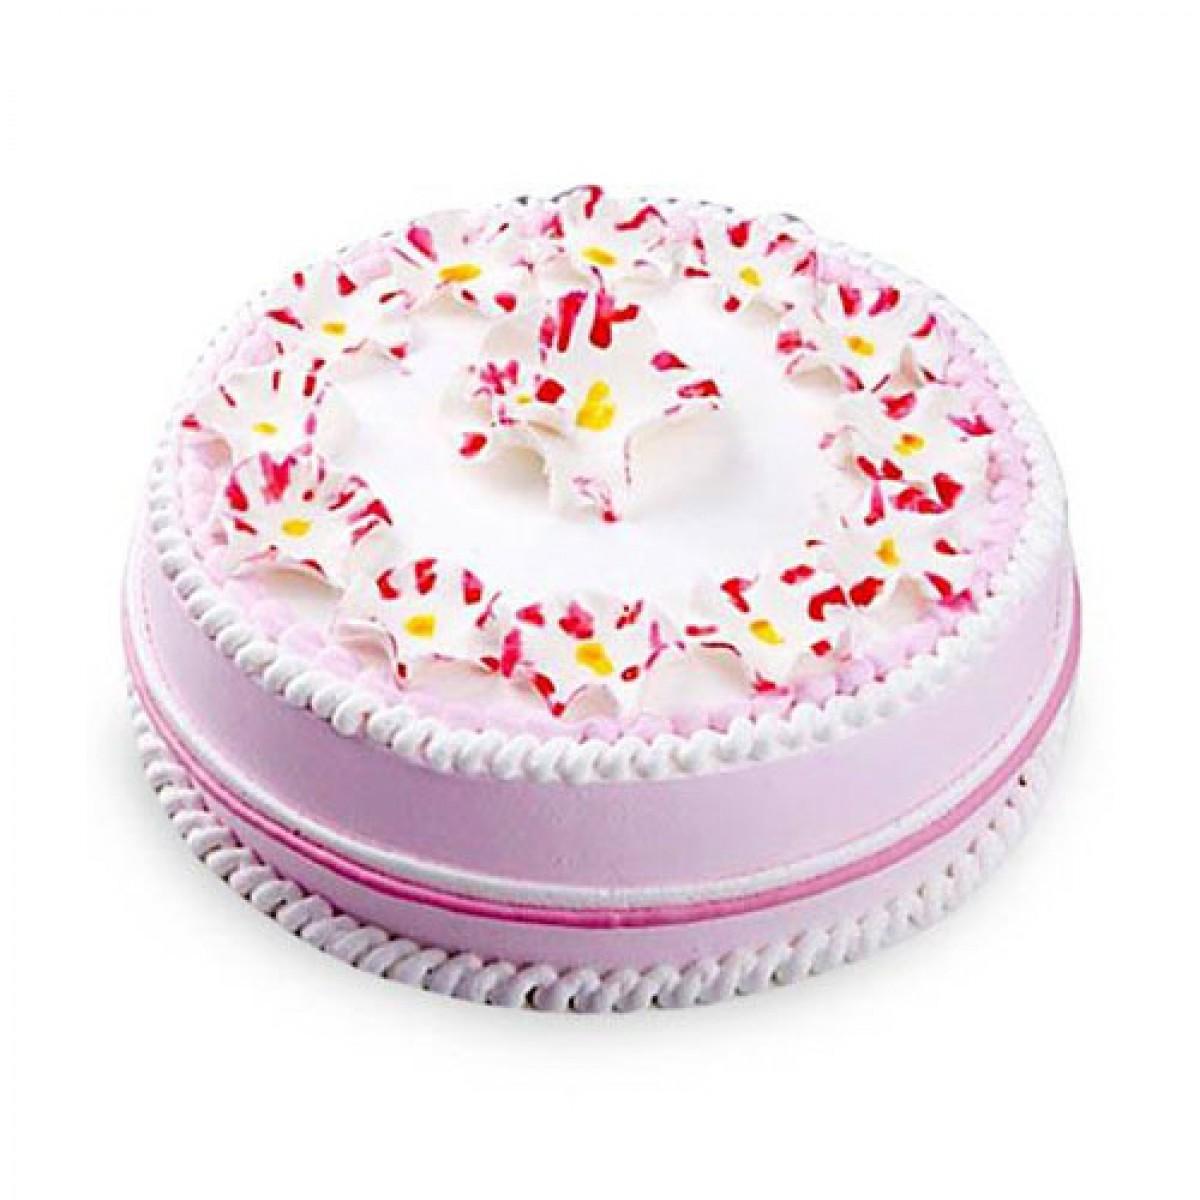 Pink Vanilla Cake Half Kg Buy Gifts Online